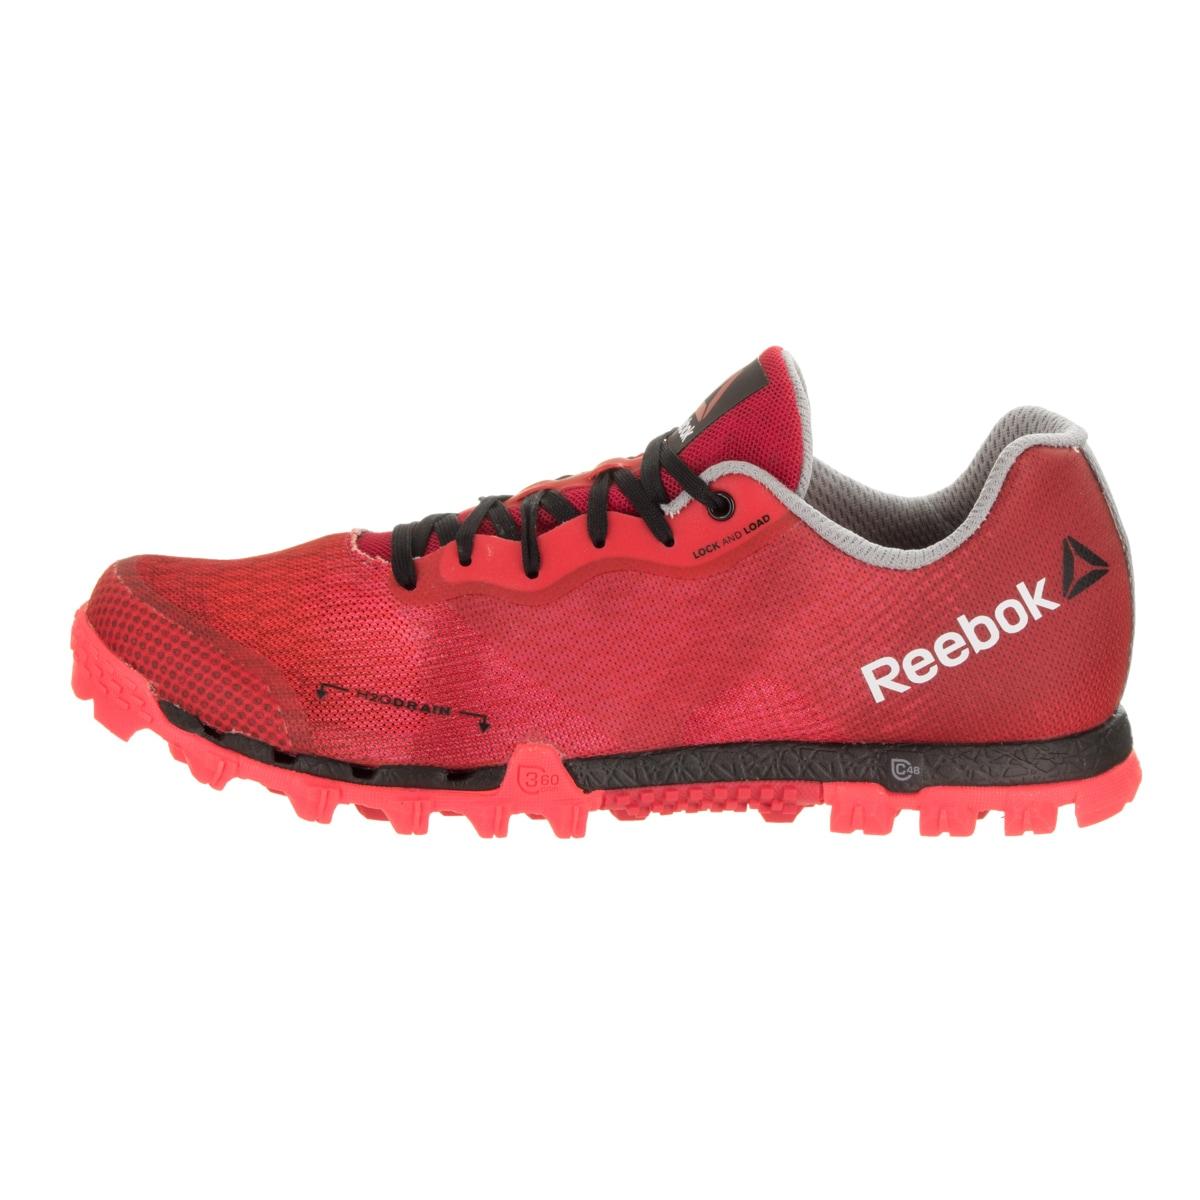 pretty nice ffaee d193c Shop Reebok Women s All Terrain Super 2.0 Running Shoe - Free Shipping  Today - Overstock - 16147982